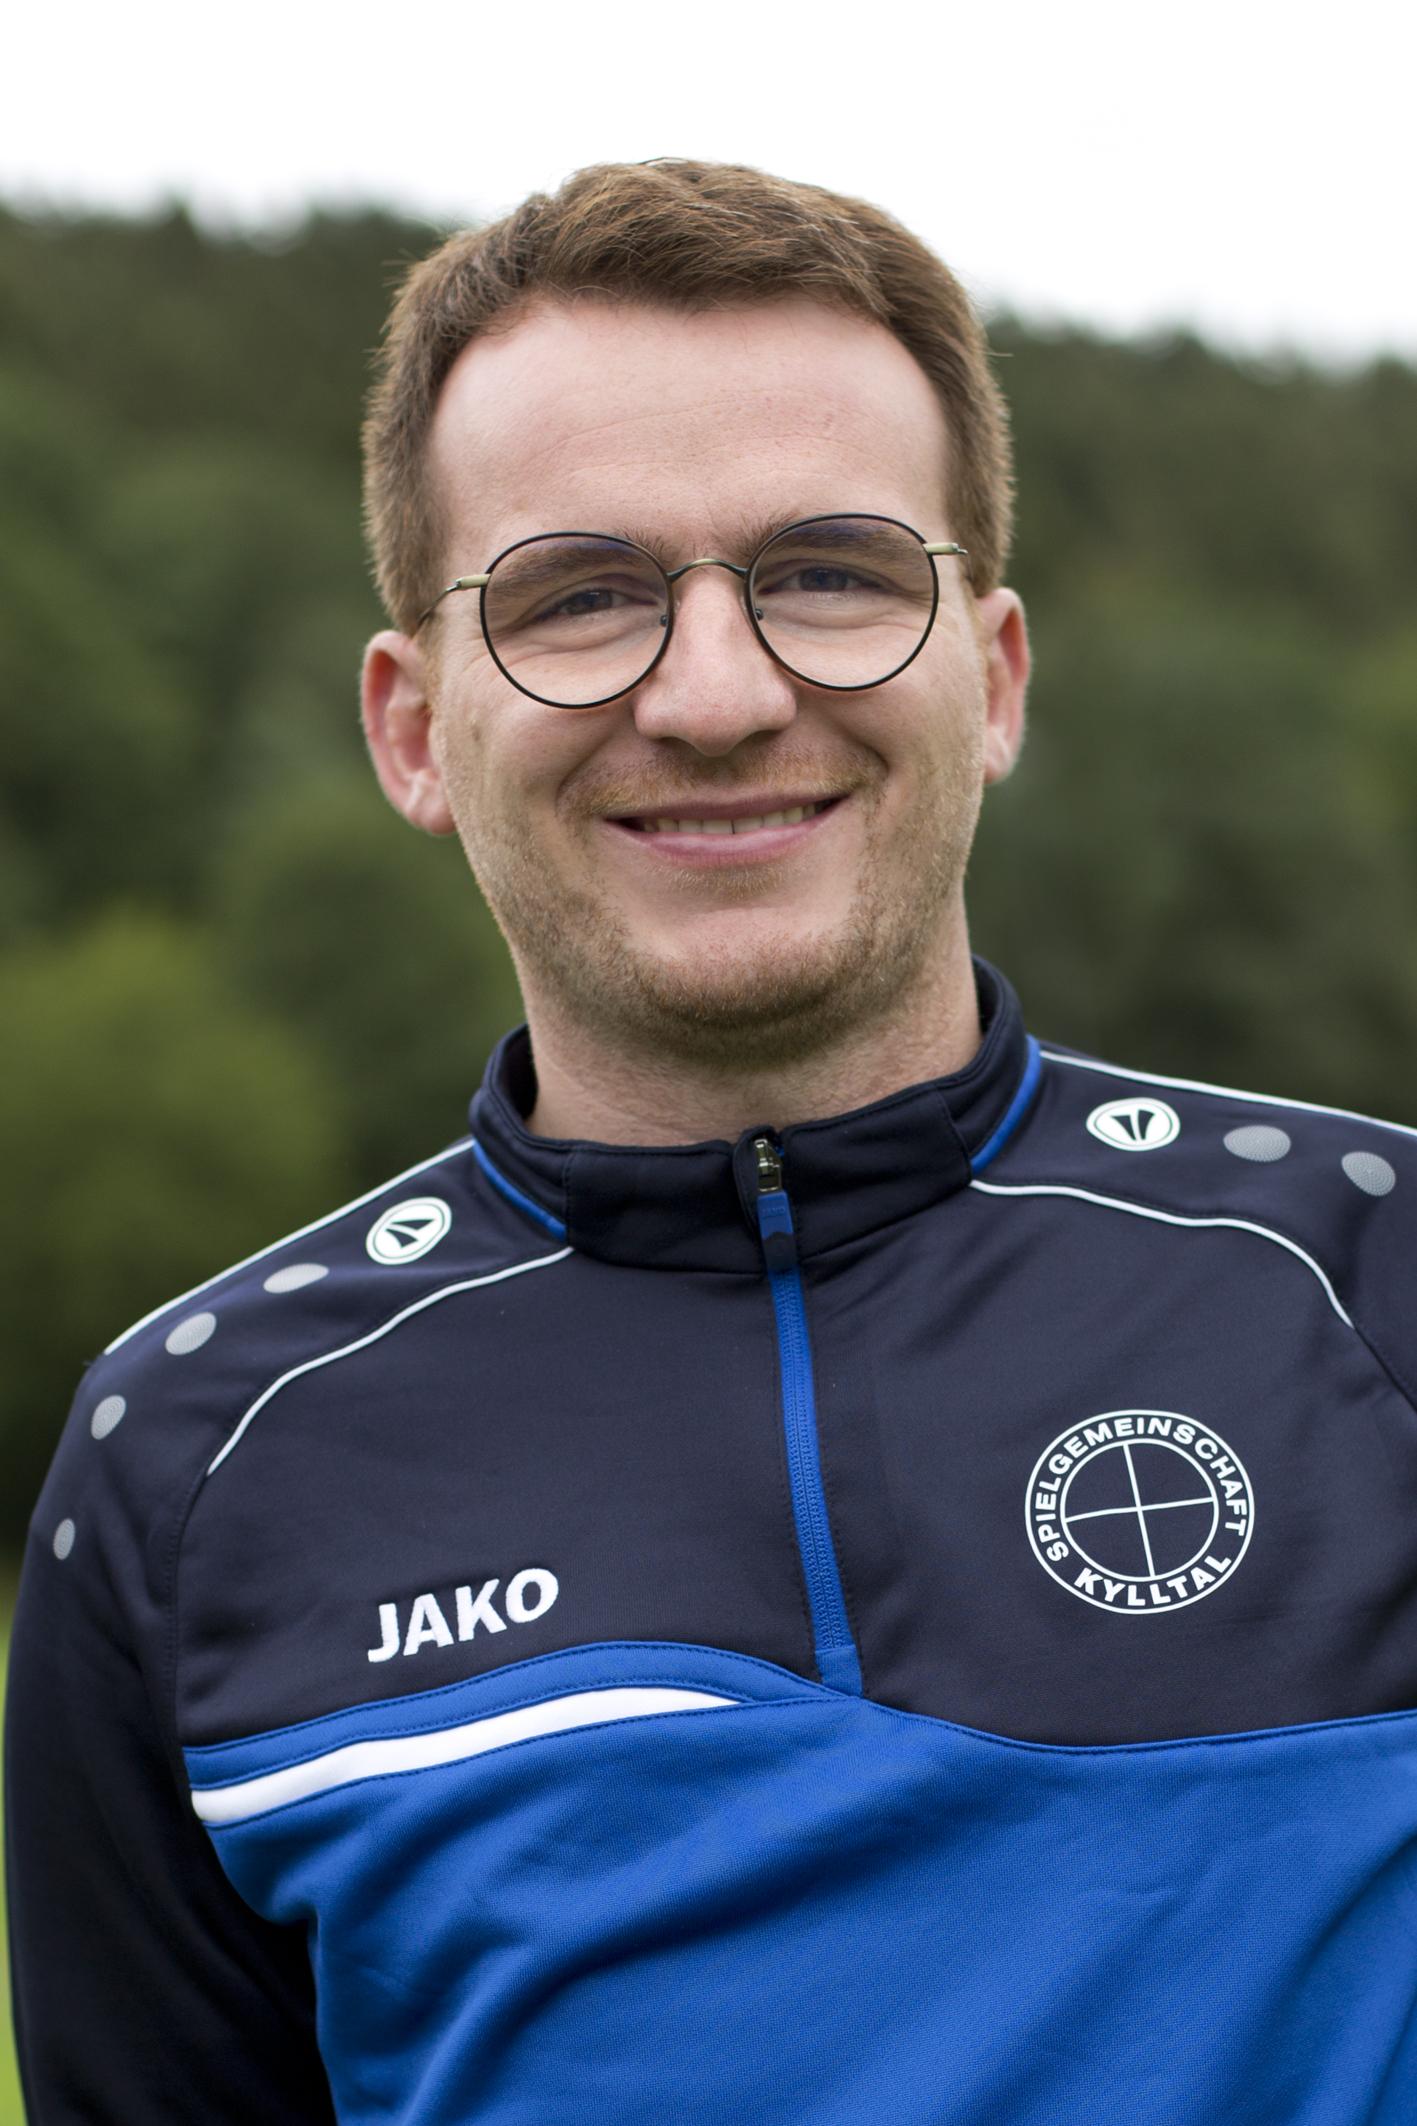 Patrick Burggraf